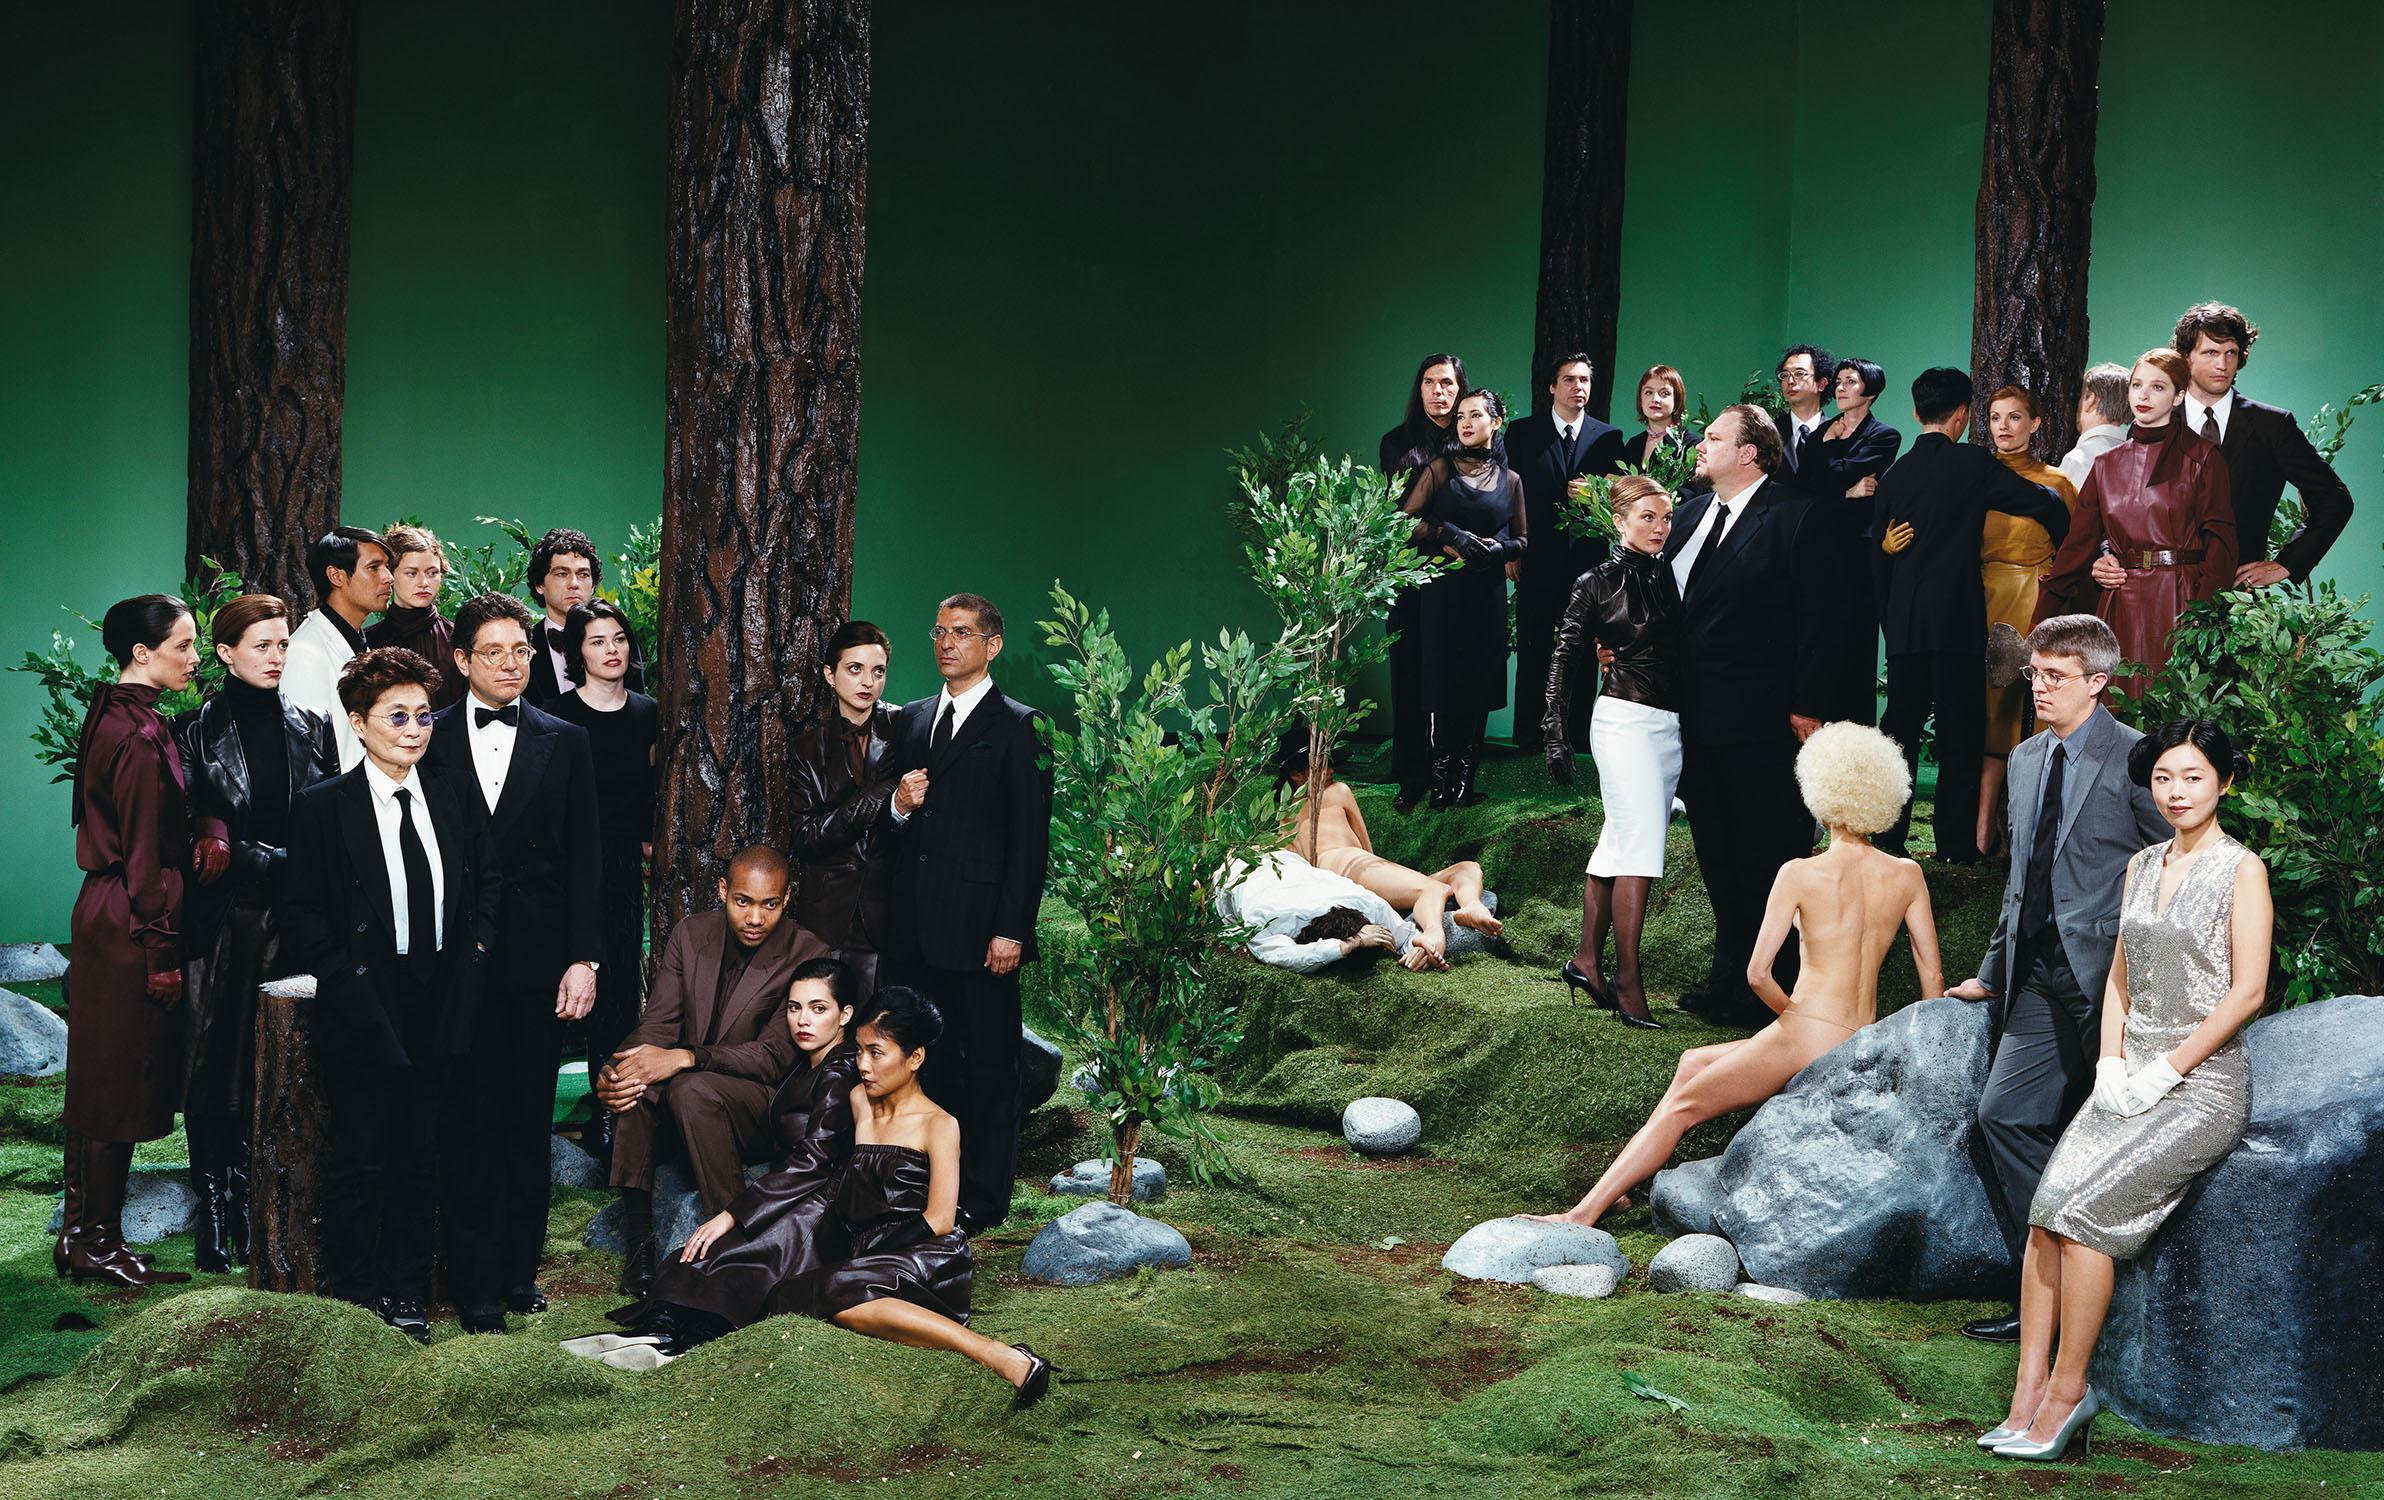 Harper's Bazaar - Deitch